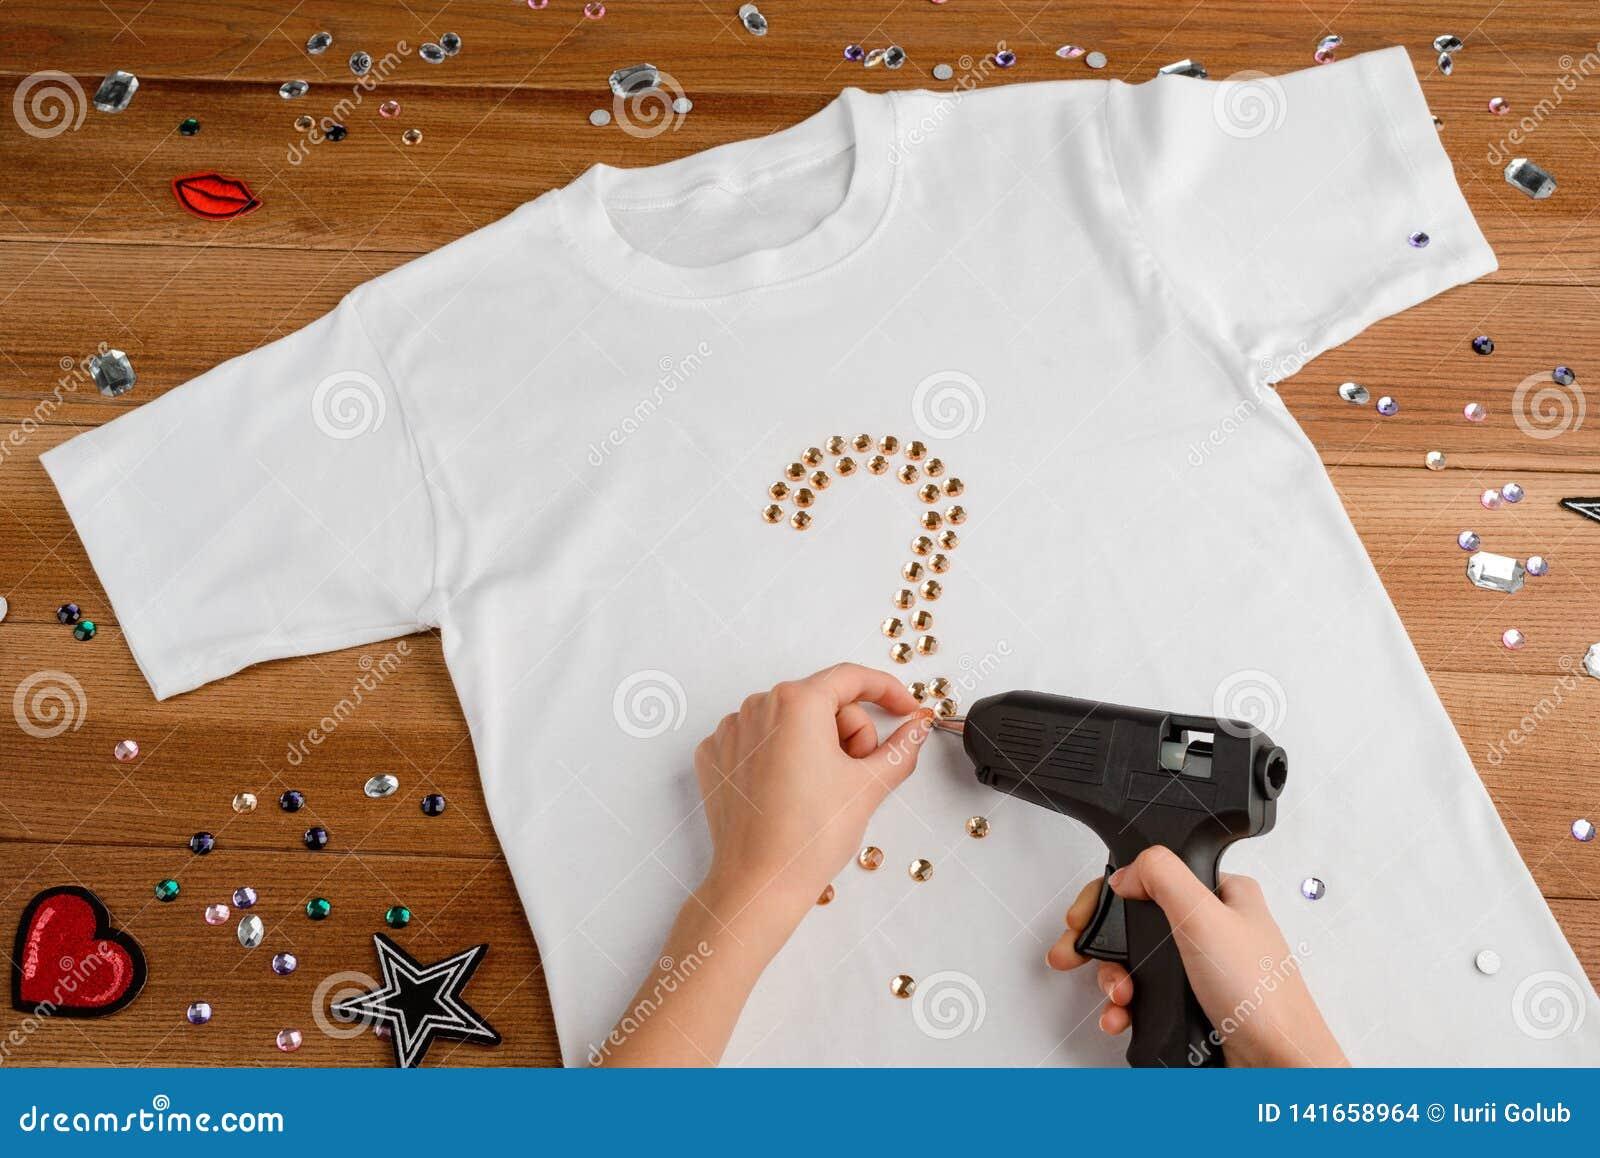 Girl Applying Rhinestones To T-shirt Stock Photo - Image of blank